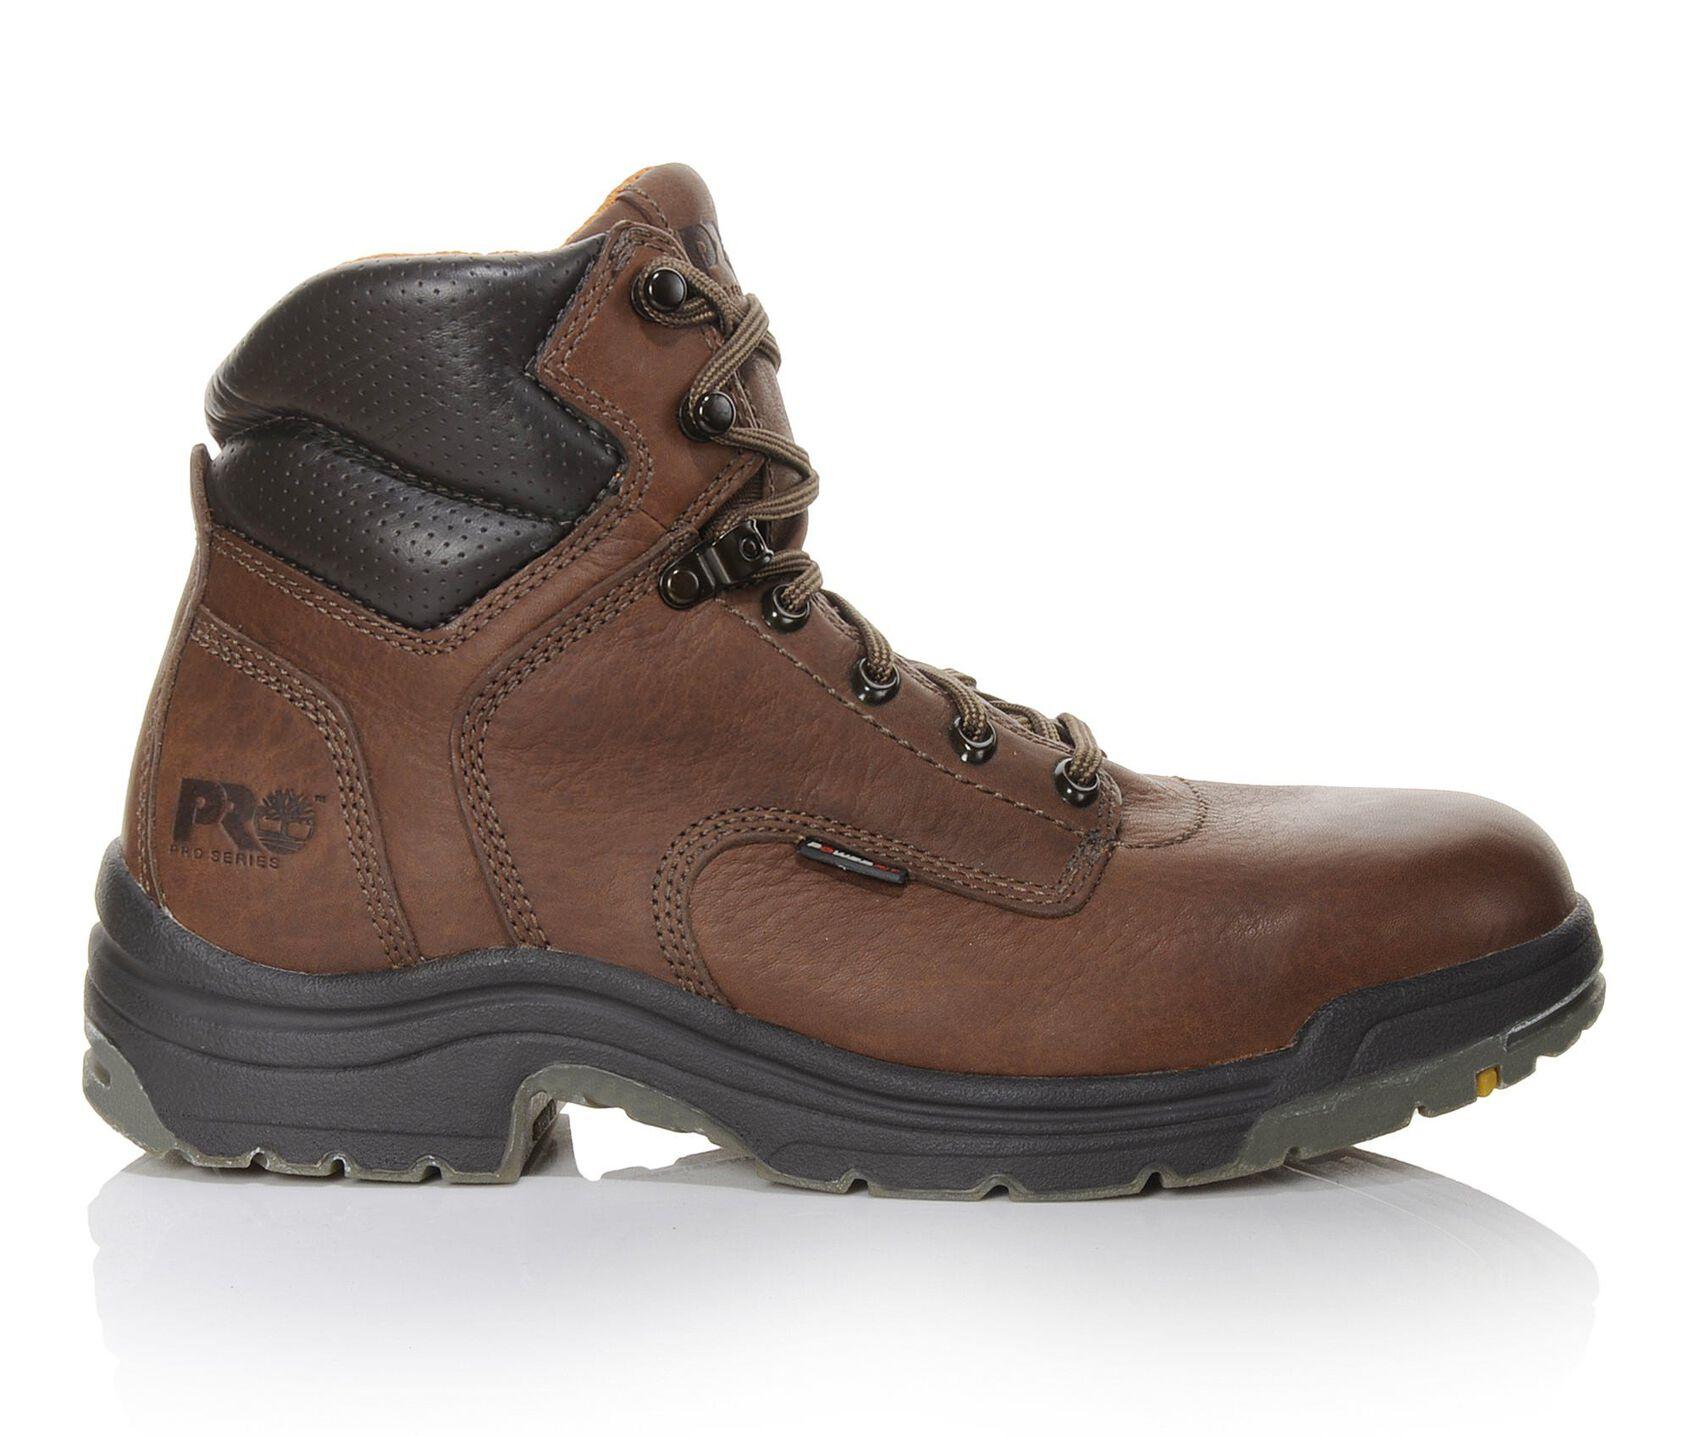 8cca5856889 Men's Timberland Pro Titan 6 Inch 24097 Soft Toe Work Boots | Shoe ...